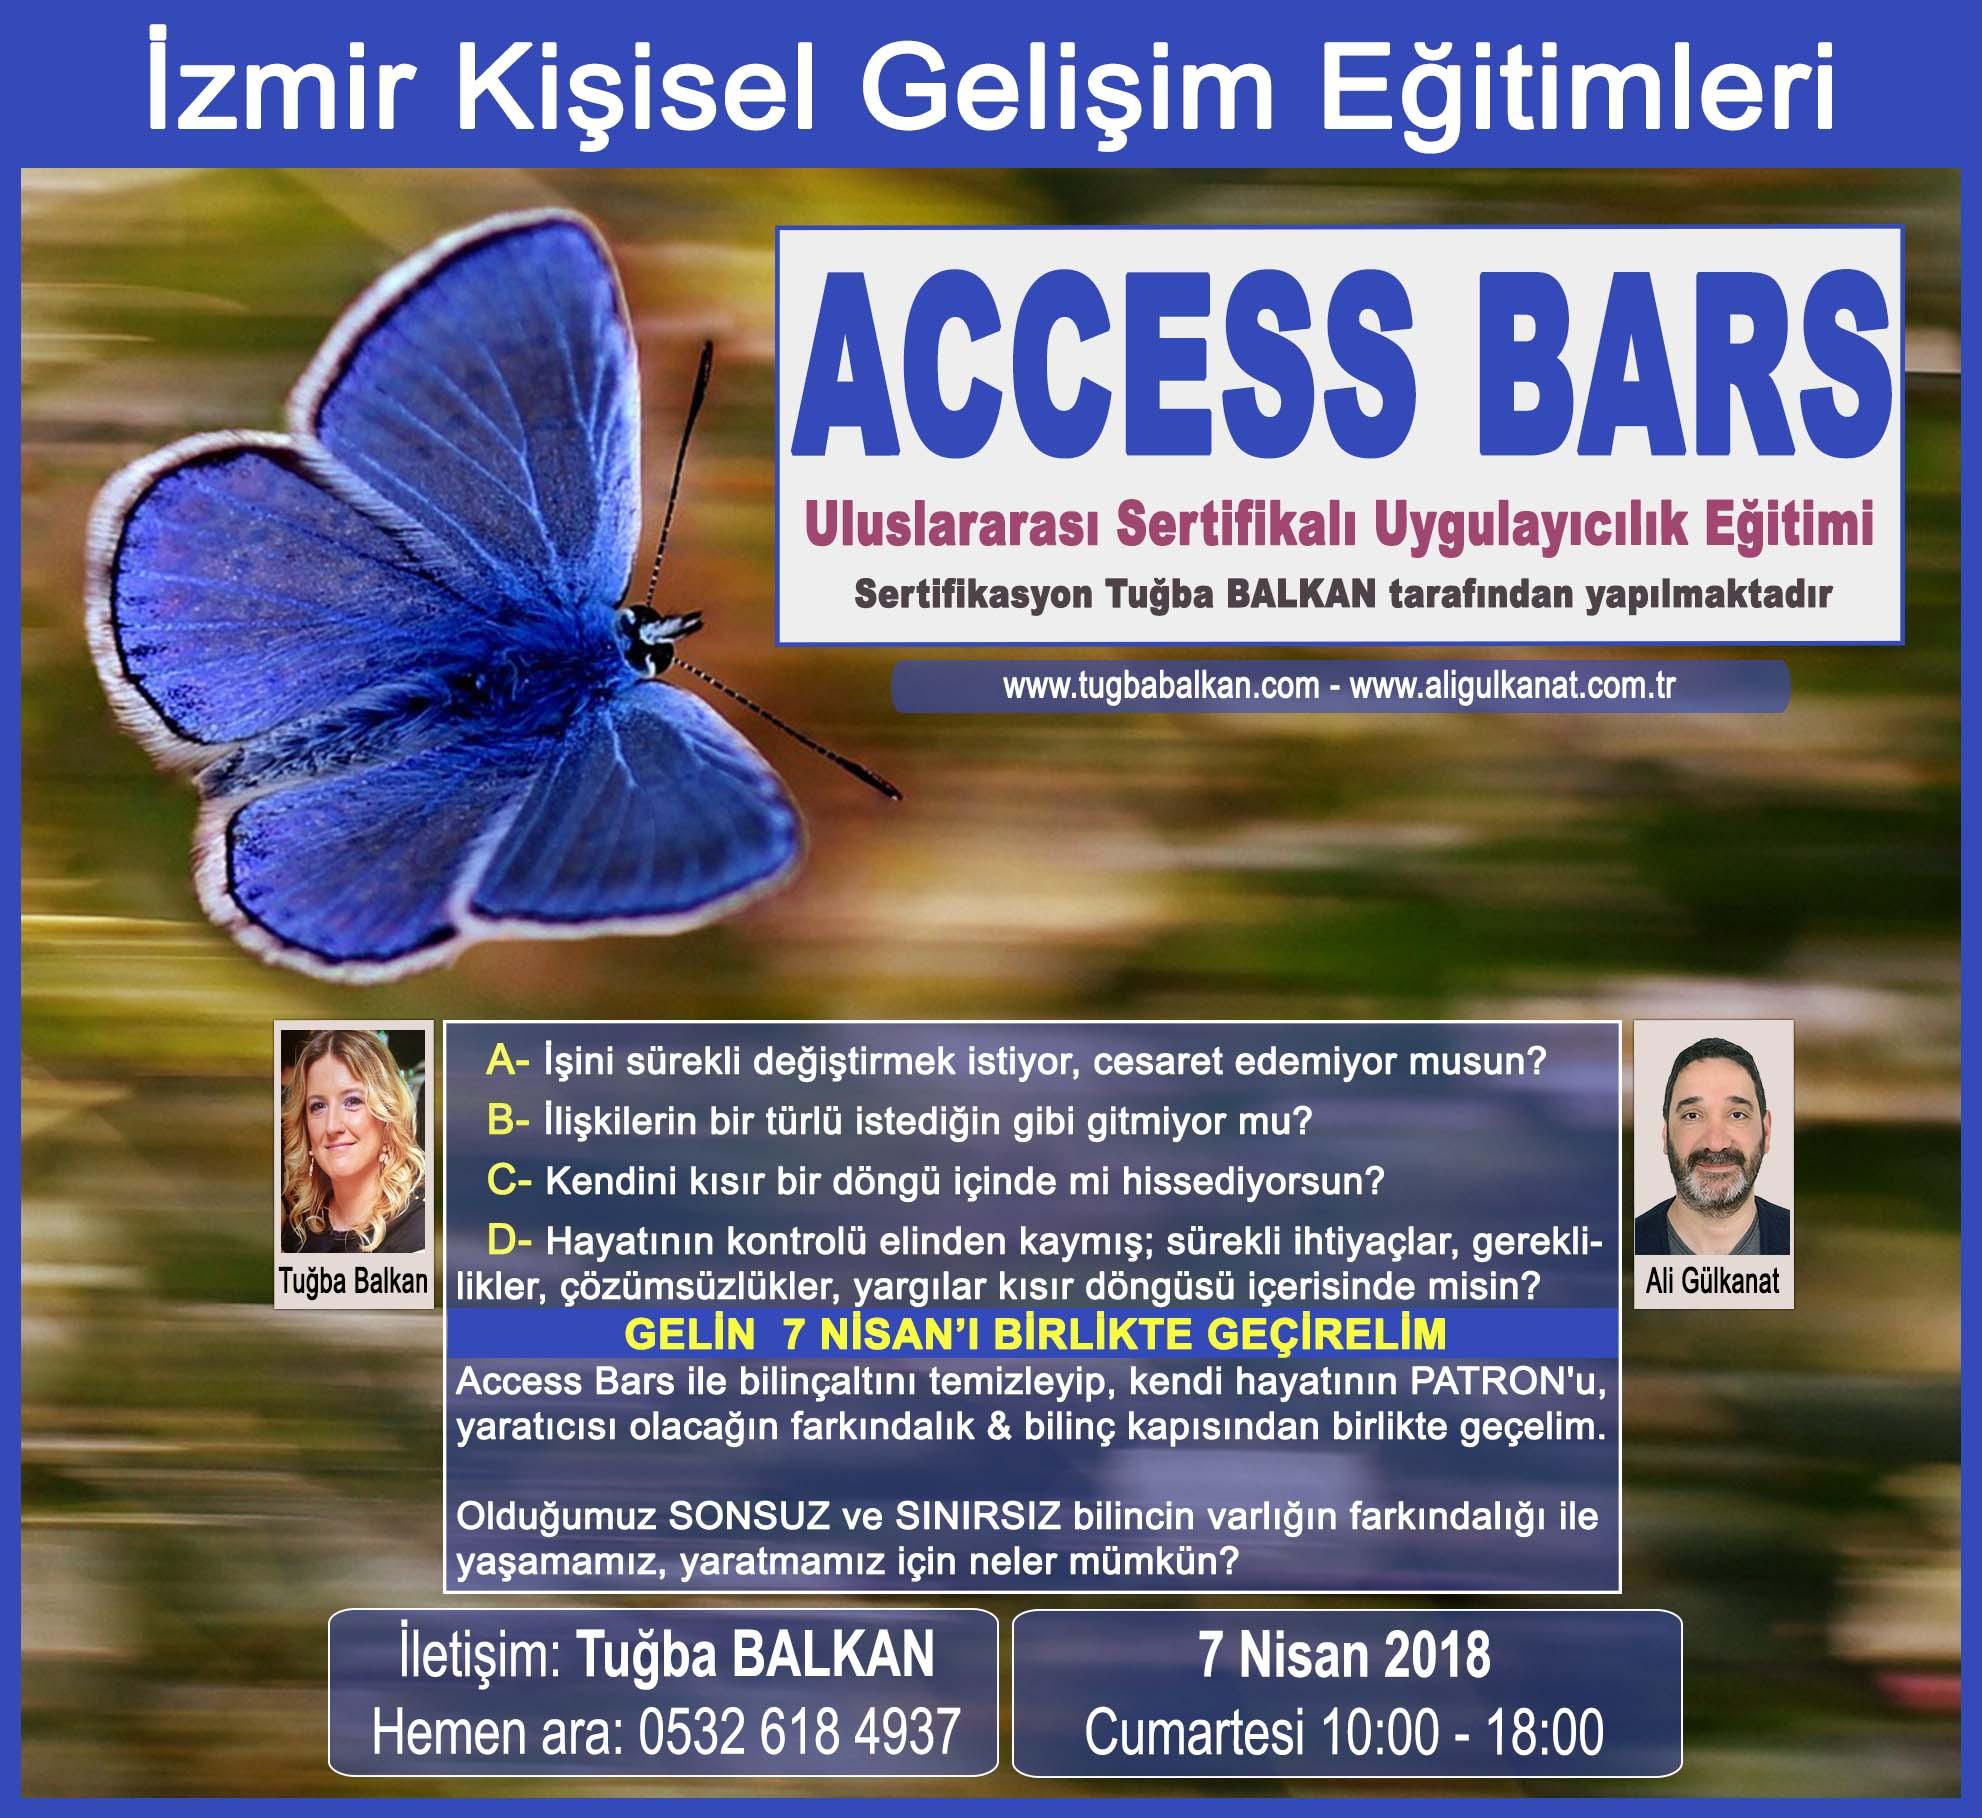 access-bars-tanitim-7-nisan-2018-1